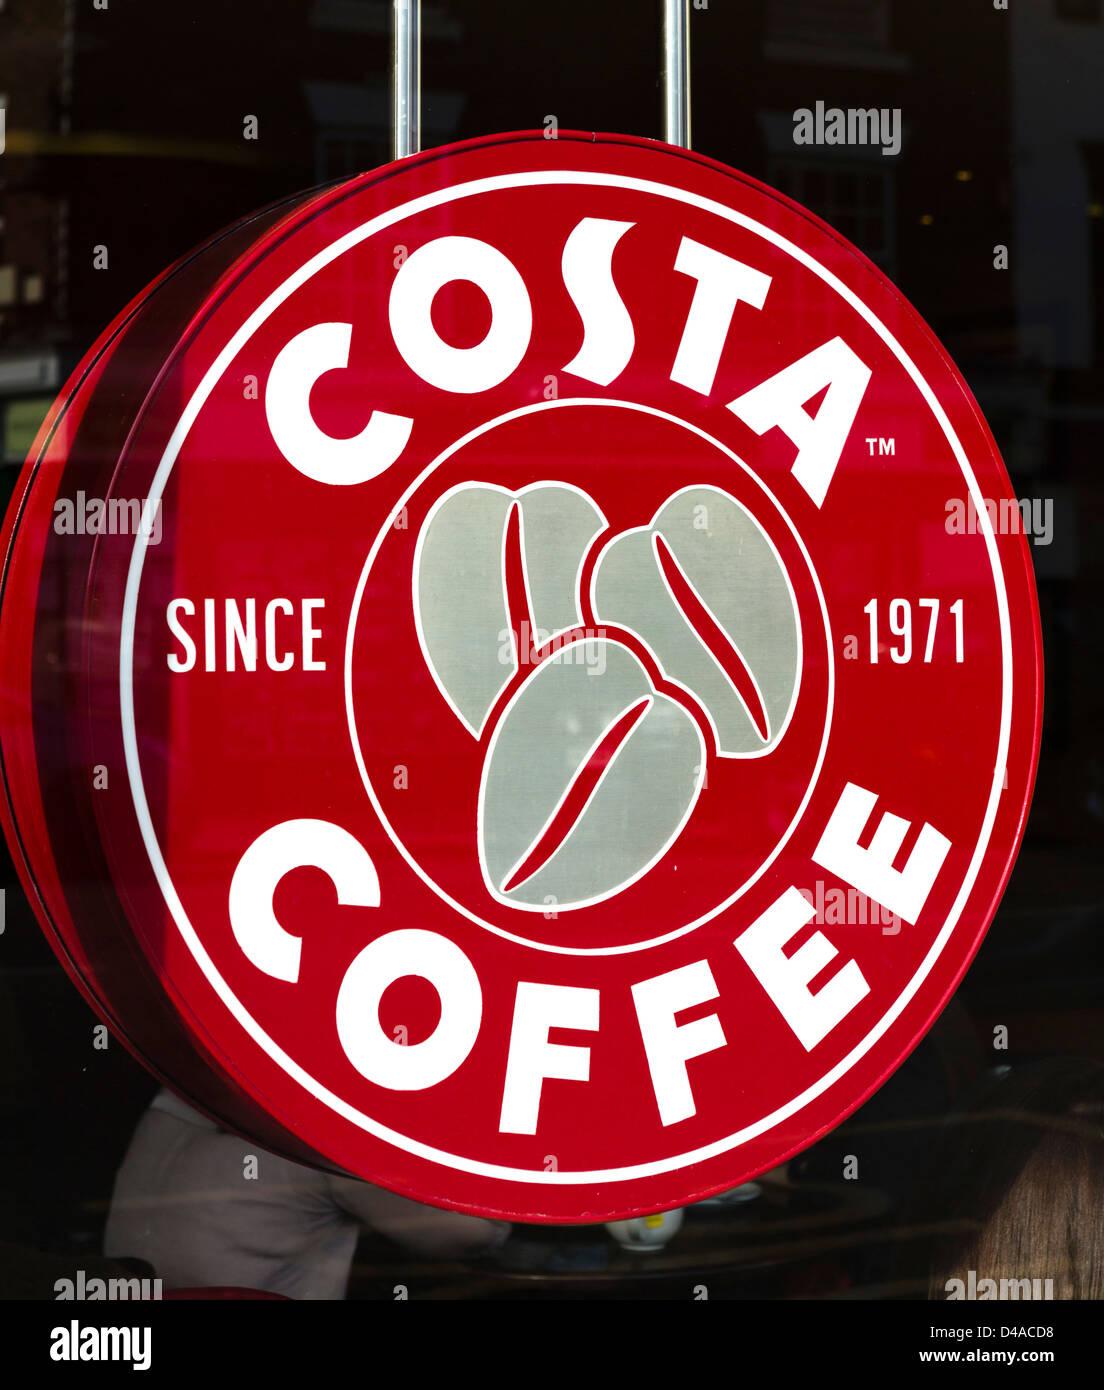 Costa coffee shop, UK - Stock Image